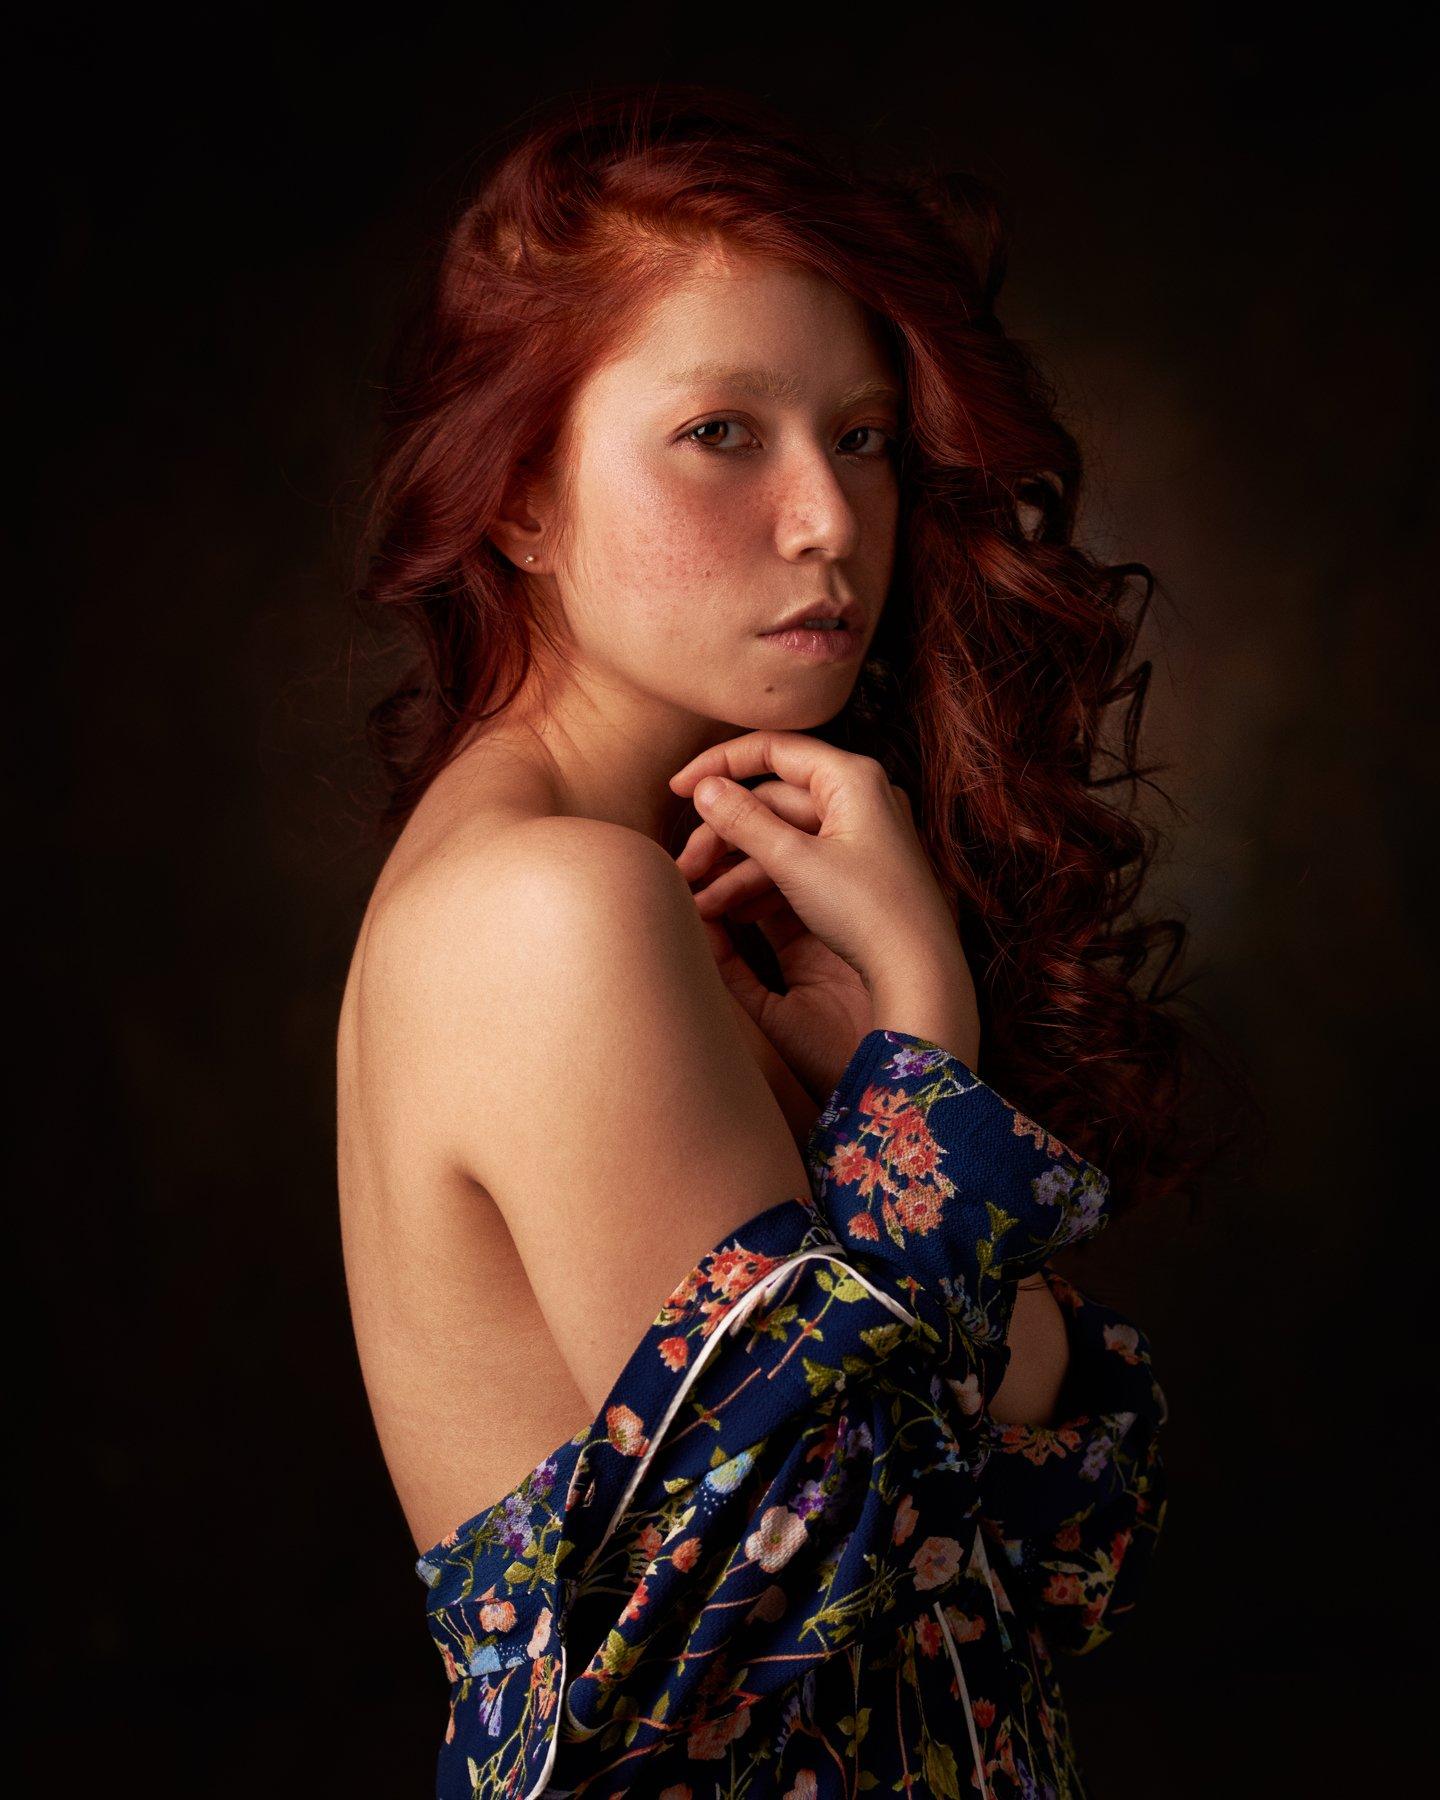 pyzhikphoto, портрет, классика, классический портрет, портрет девушки, женский портрет, portrait, classic, art, красавица, фото, девушка, рыжая, веснушки, глаза, Пыжик Максим